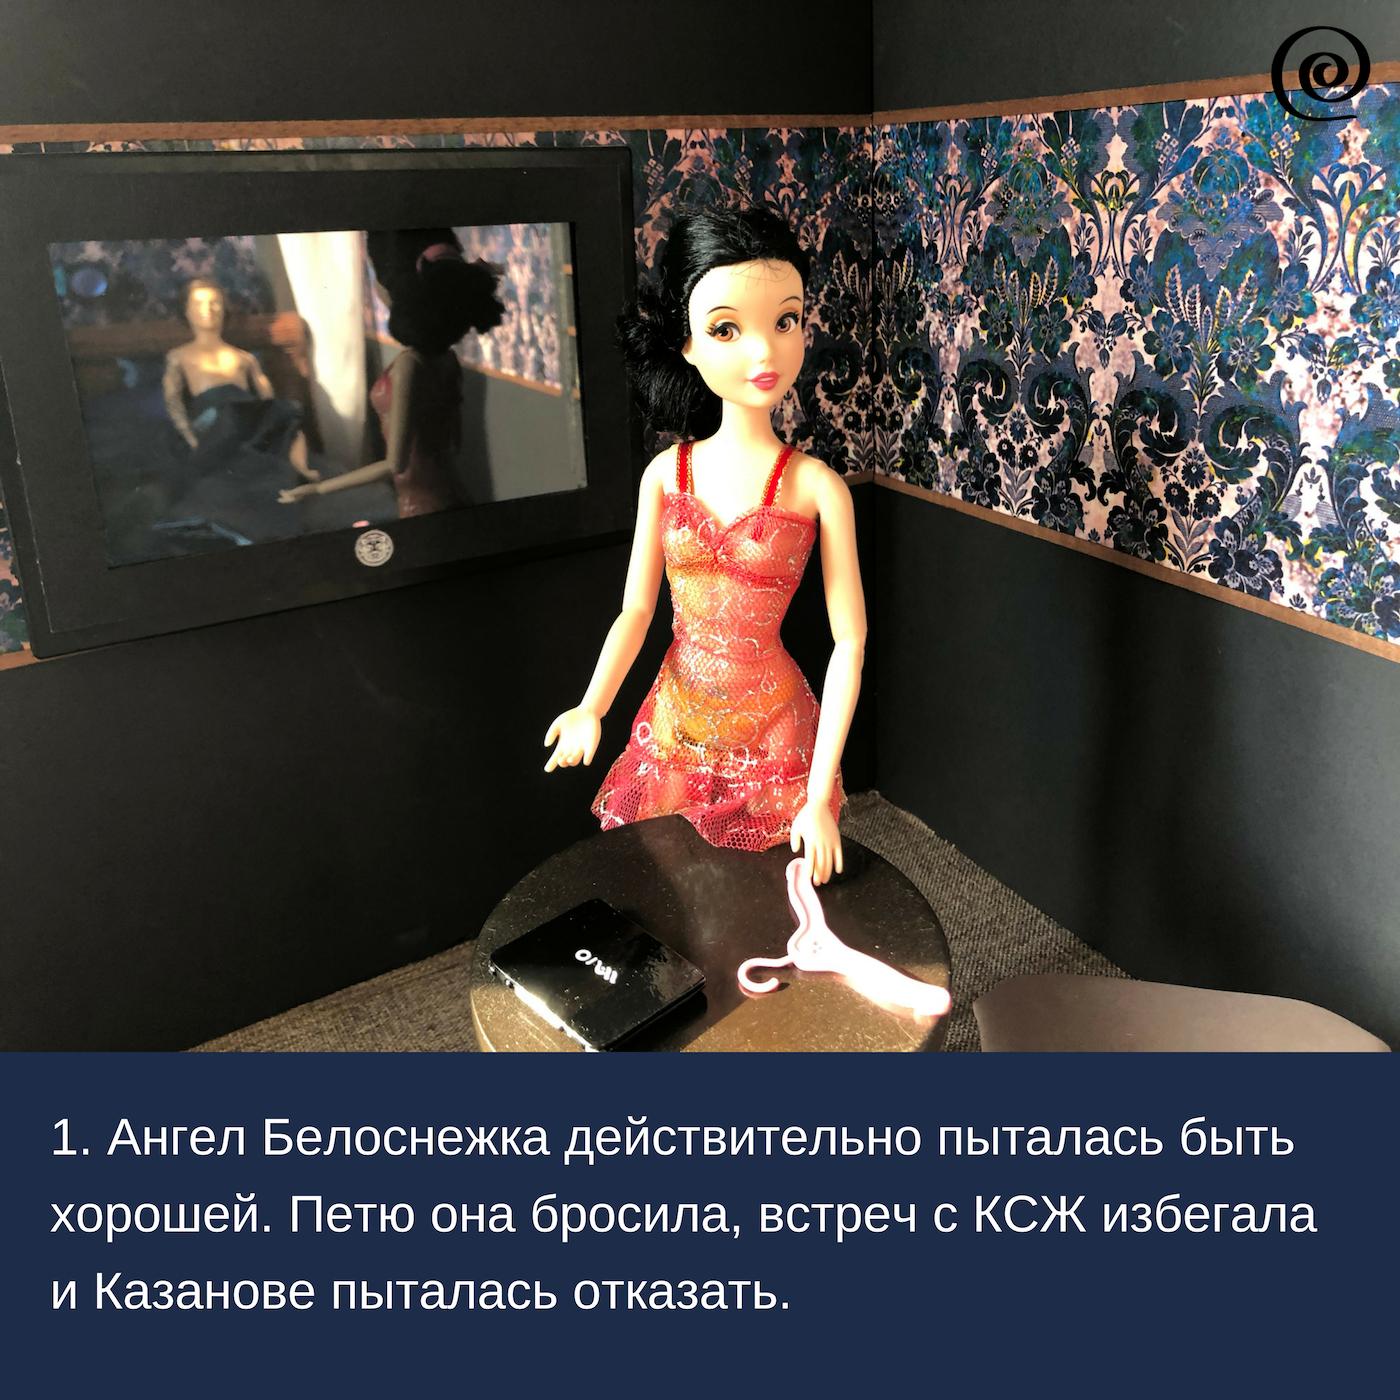 Фотосериал Разморозка. Сезон 8. Серия 4. Френдзона белоснежки. Эпизод 1